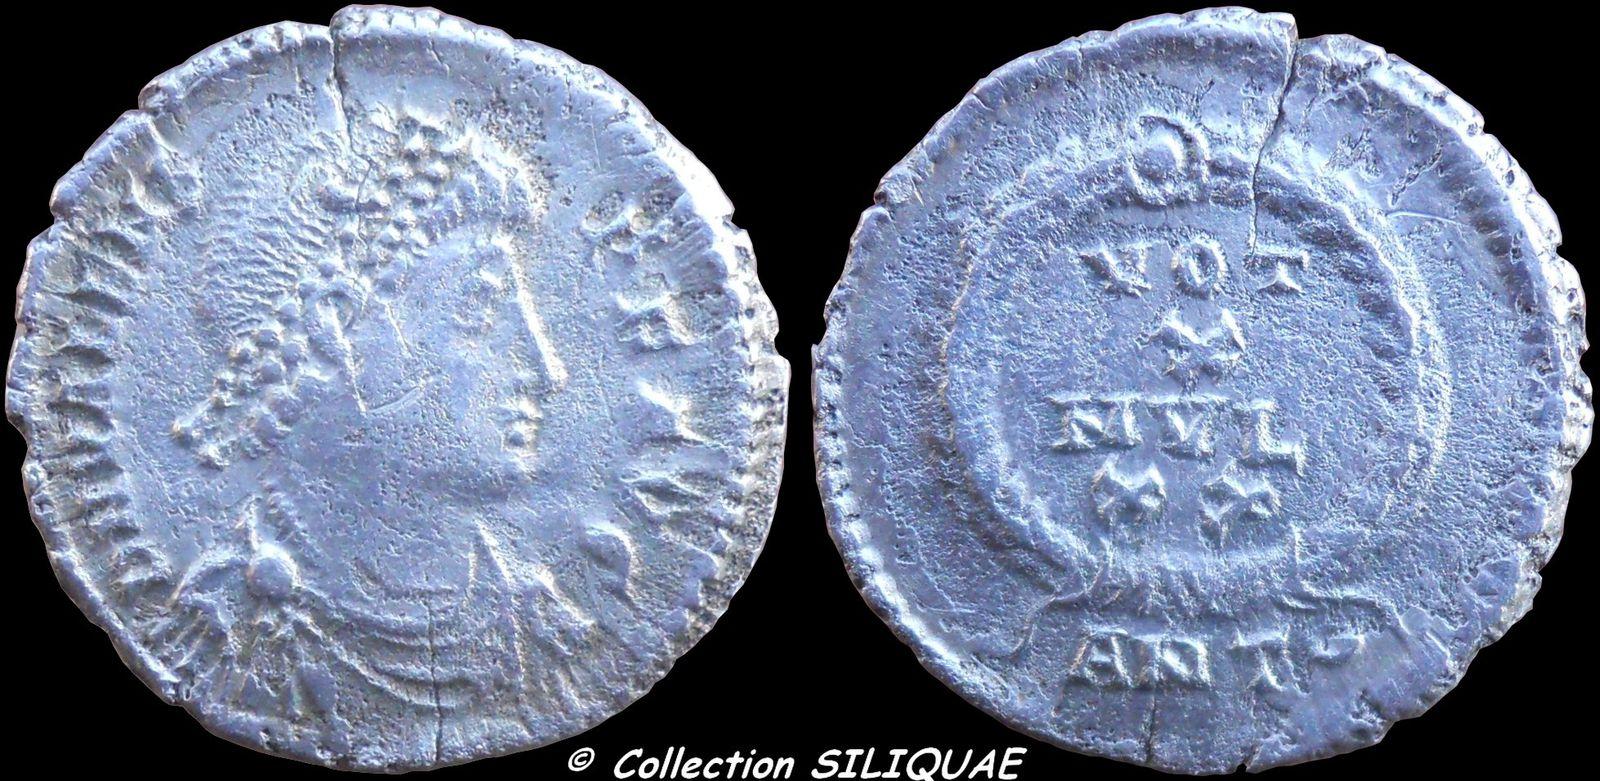 Collection Siliquae VALENS_RIC33b2